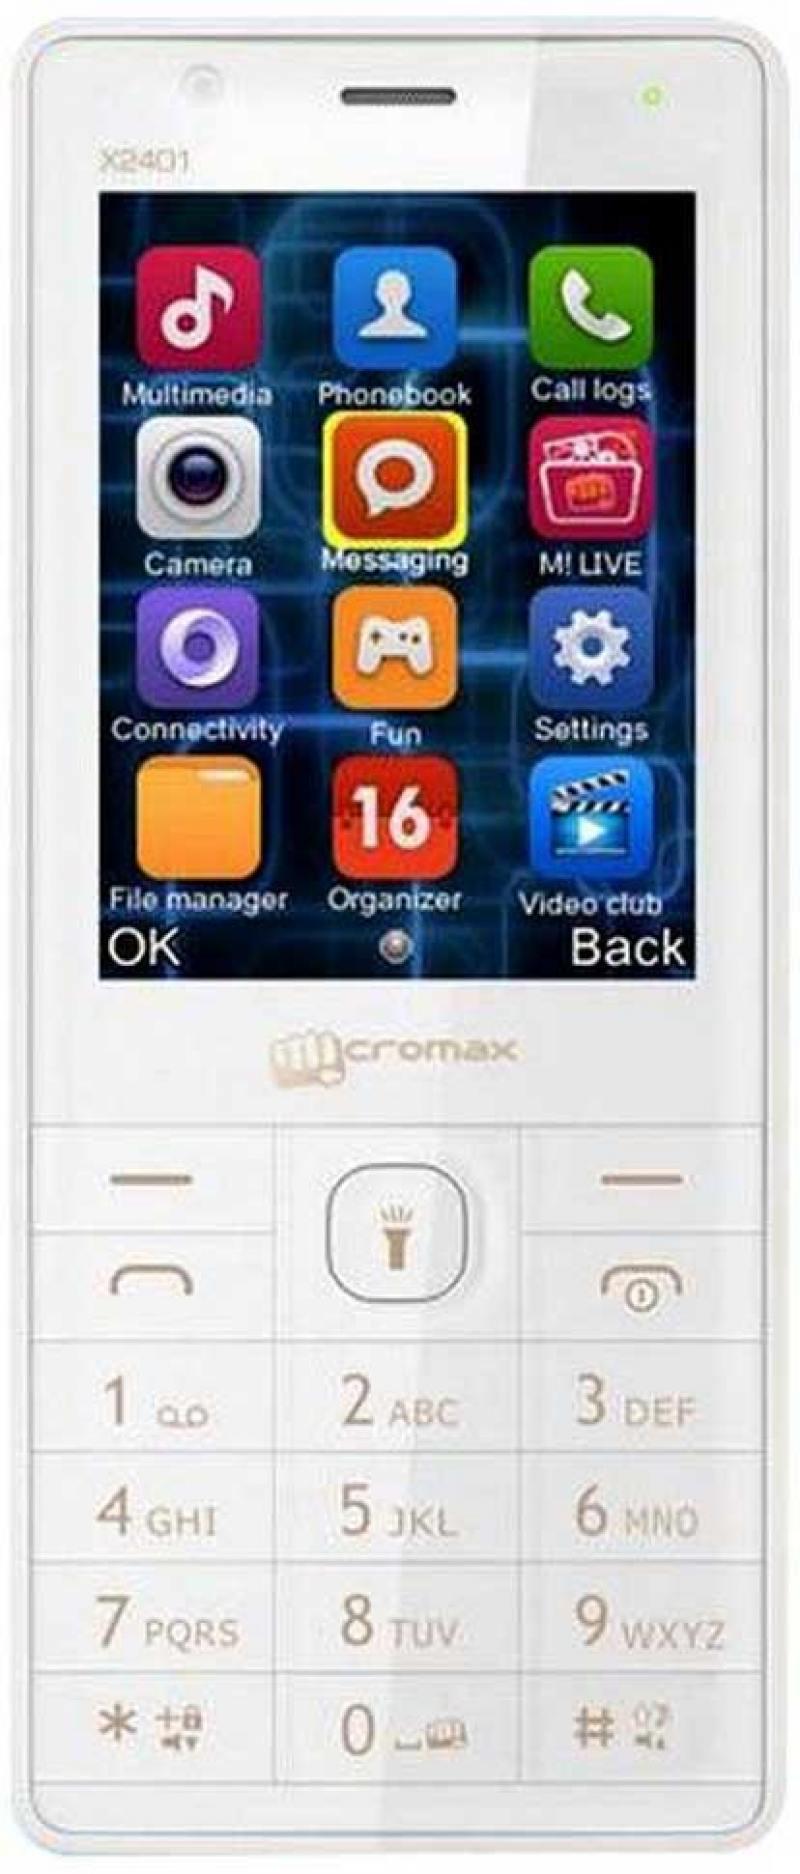 Мобильный телефон Micromax X2401 белый шампань 2.4